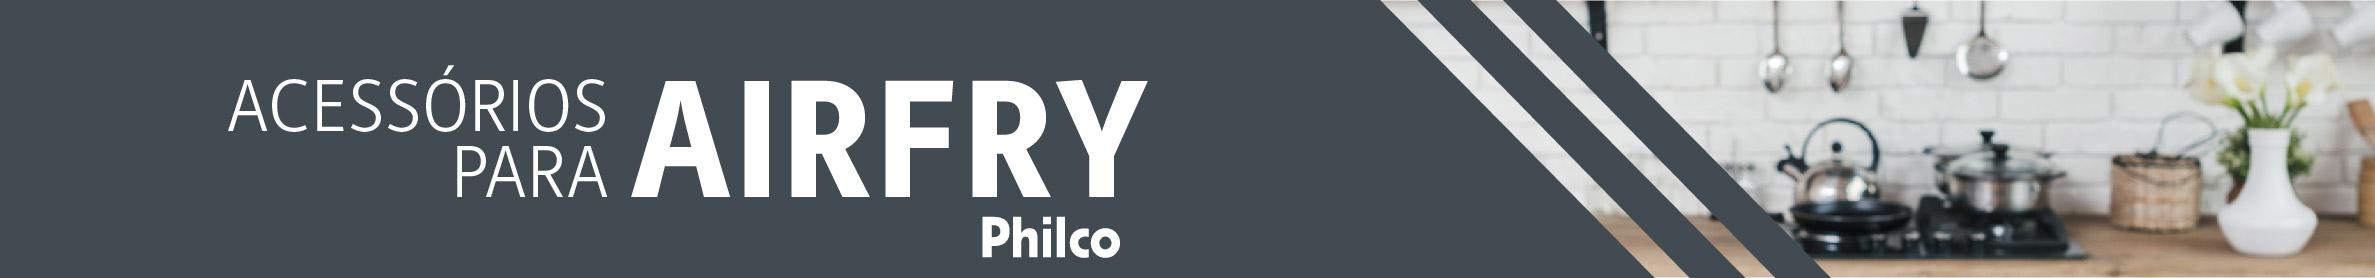 airfry-philco